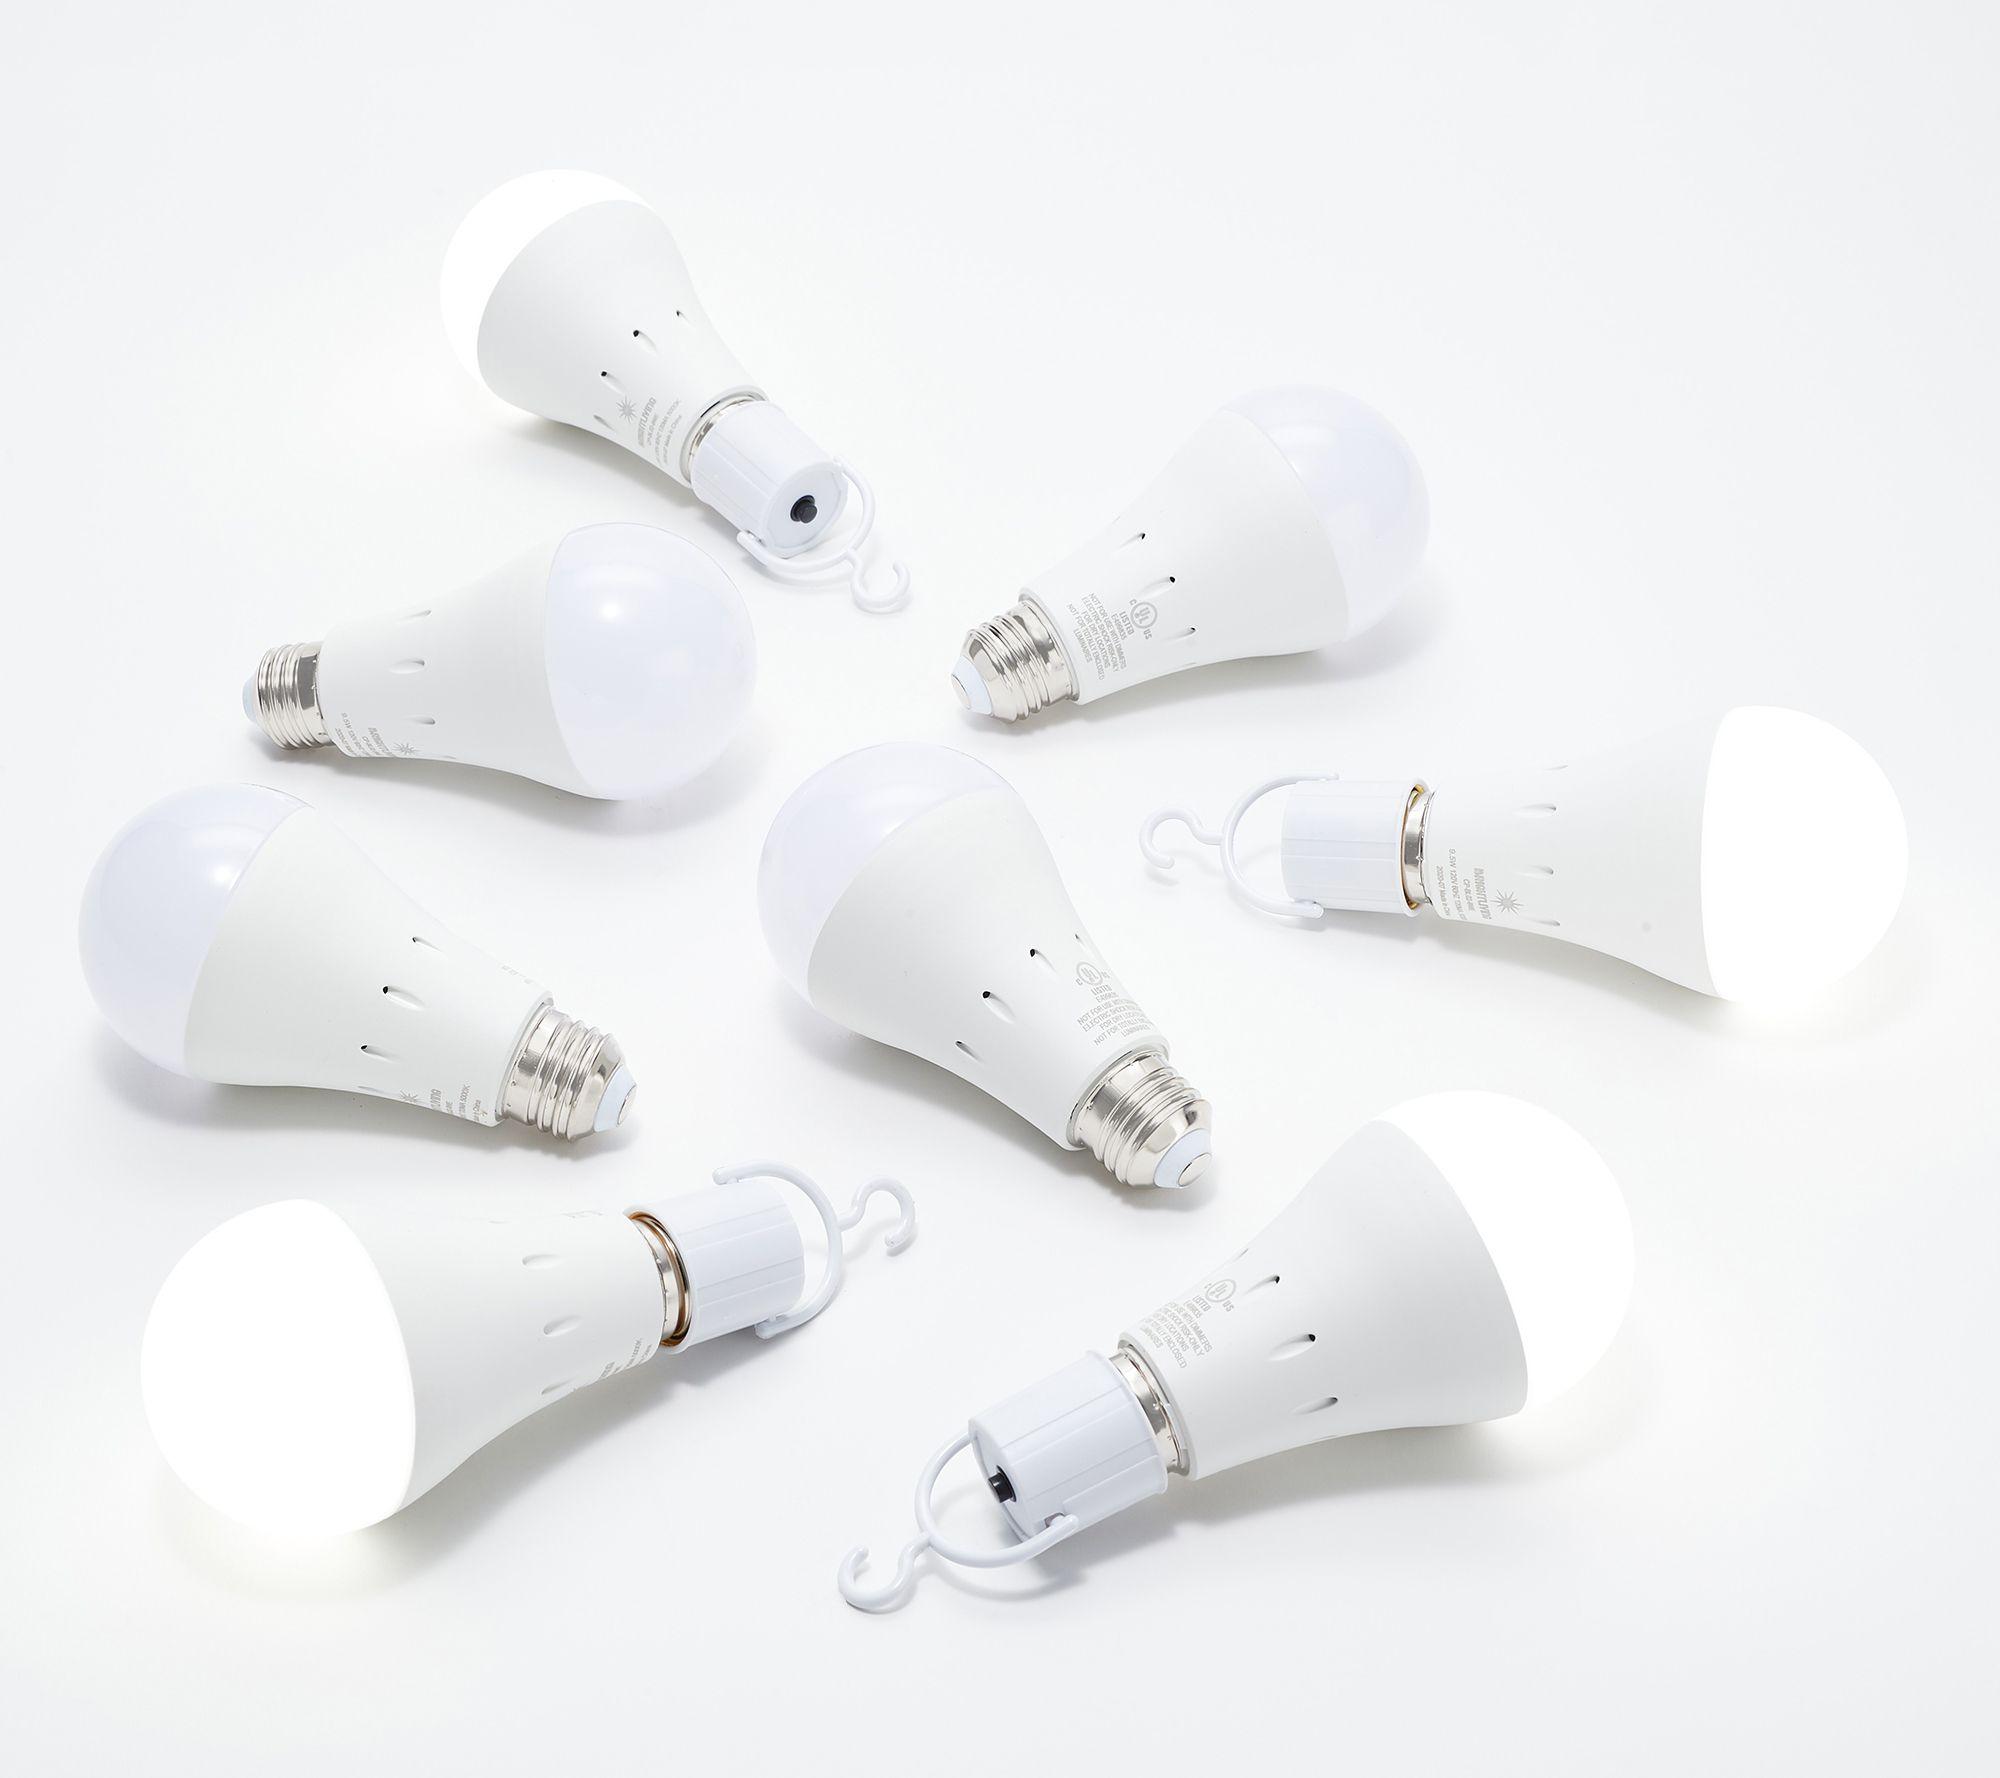 BrightLiving Set of 8 LED Lightbulbs with Built-In Battery